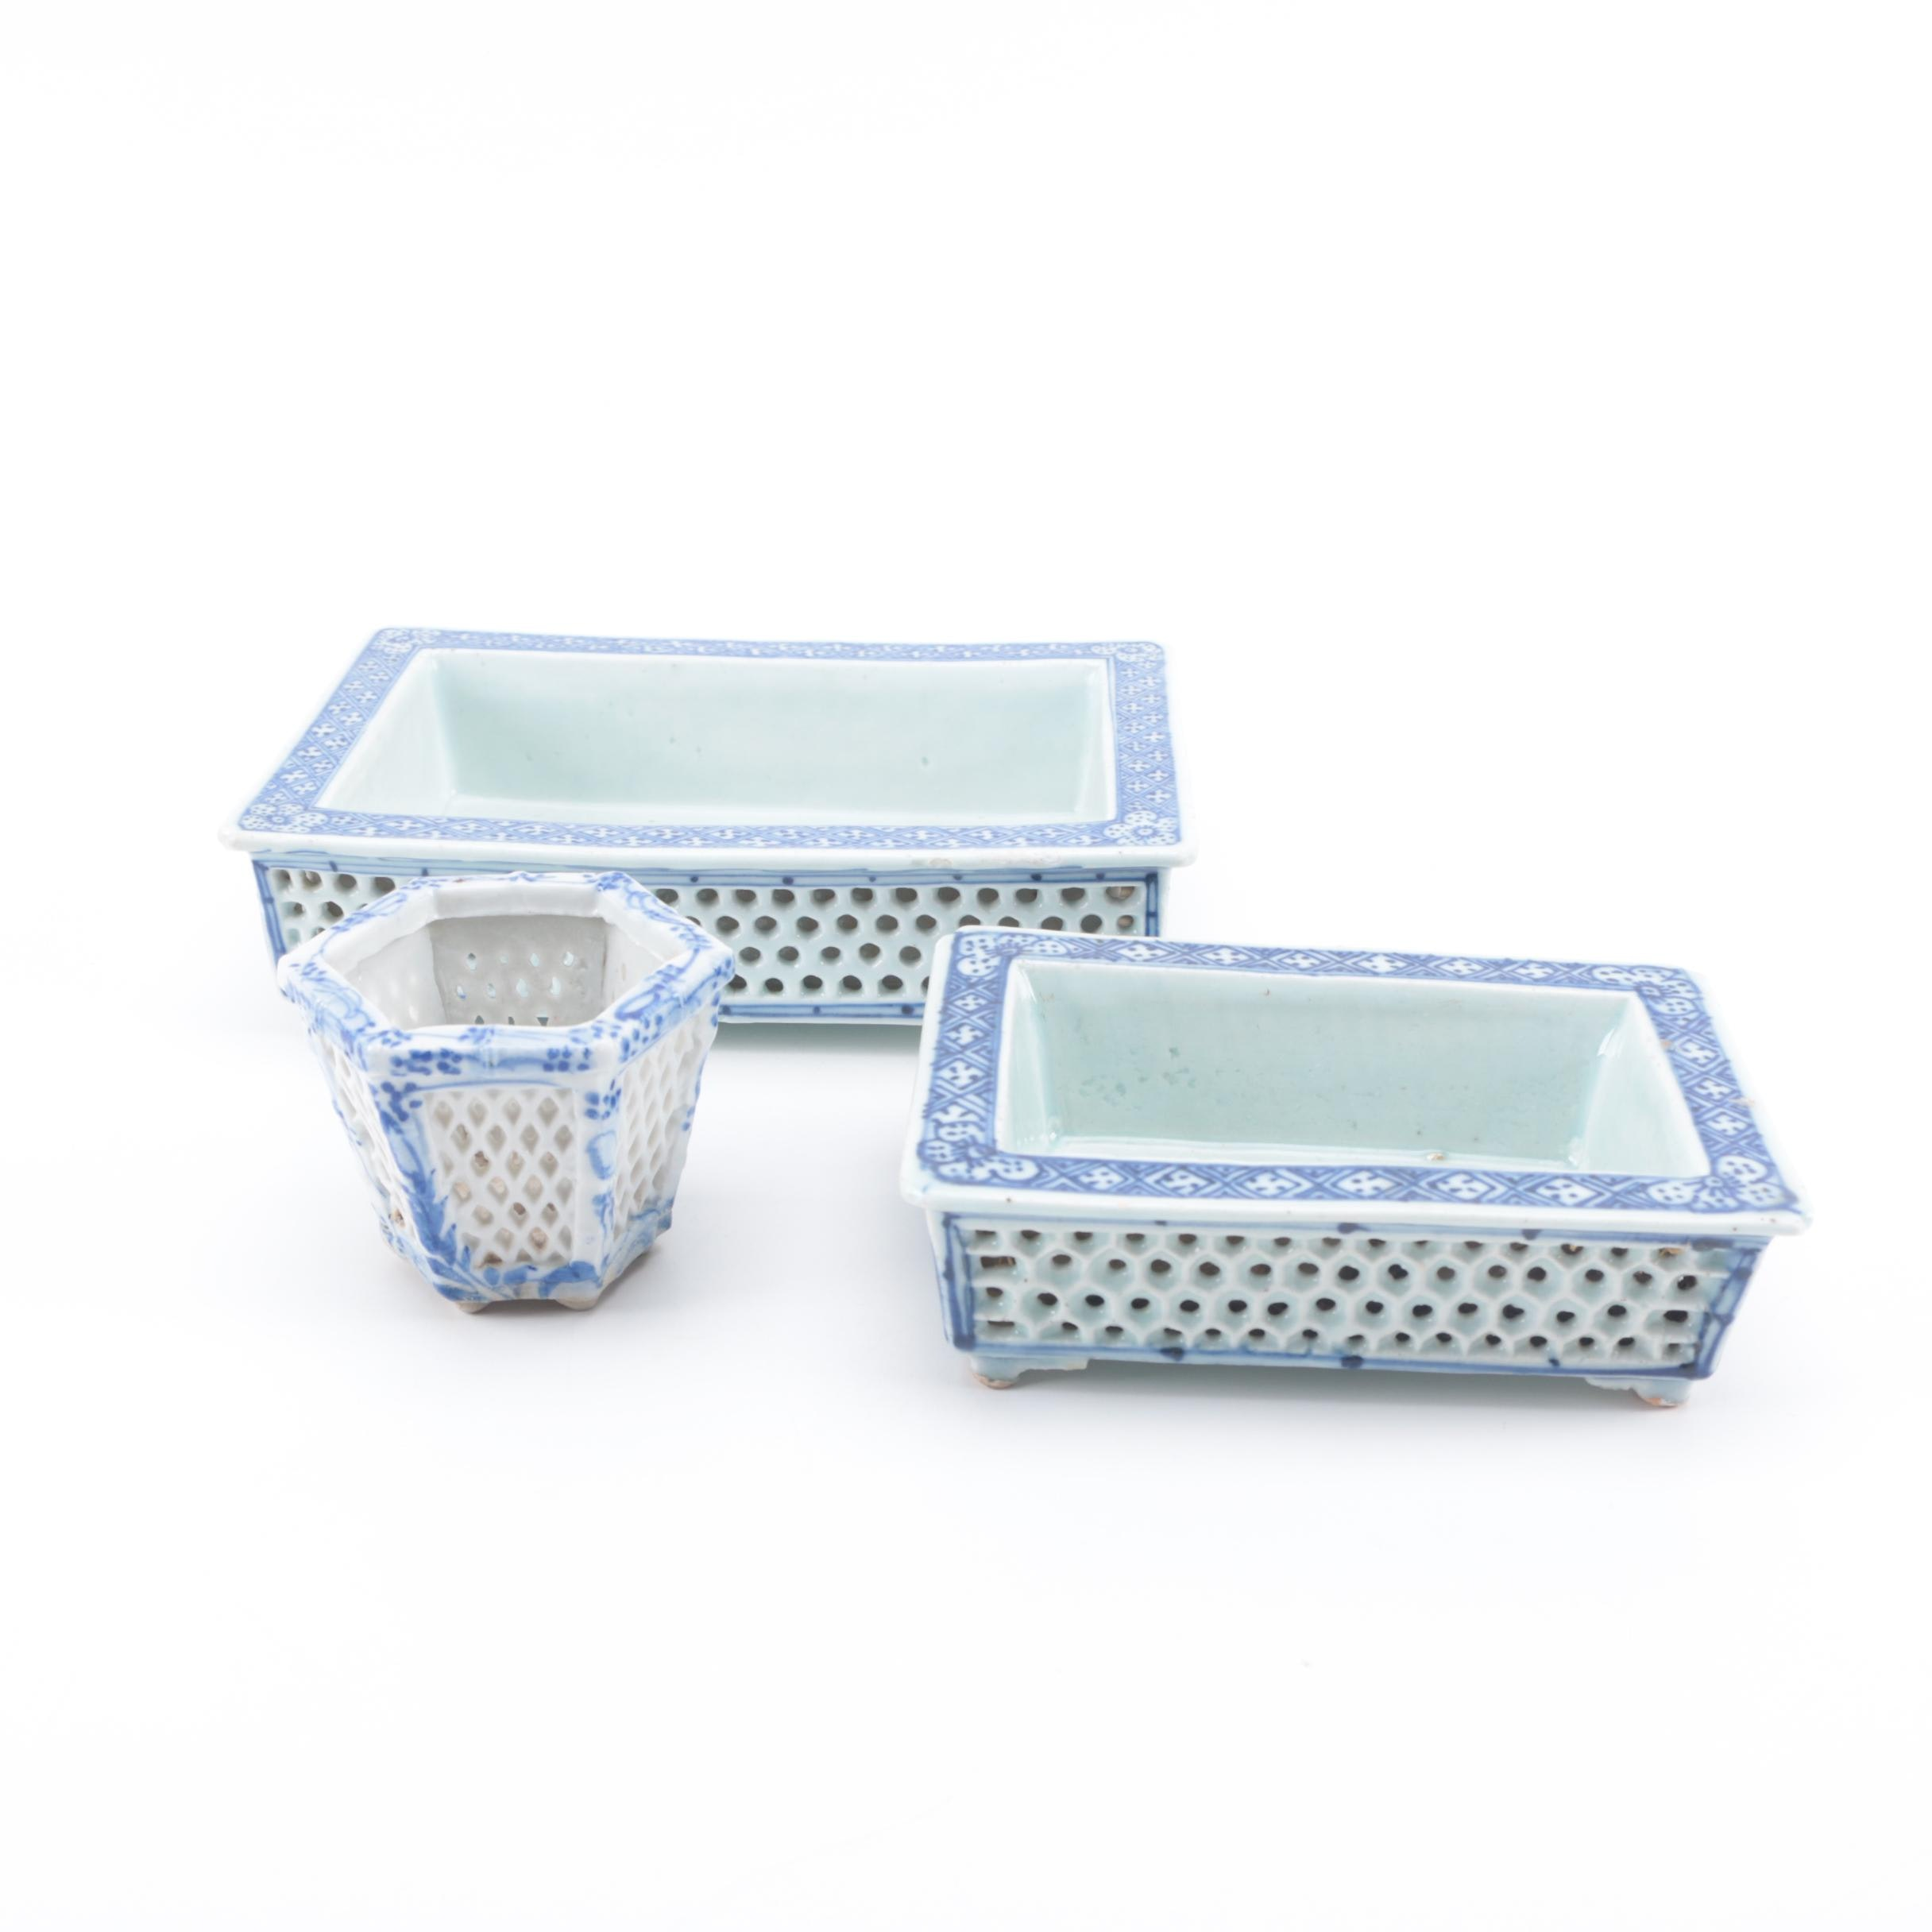 Chinese Blue and White Ceramic Basket Decor